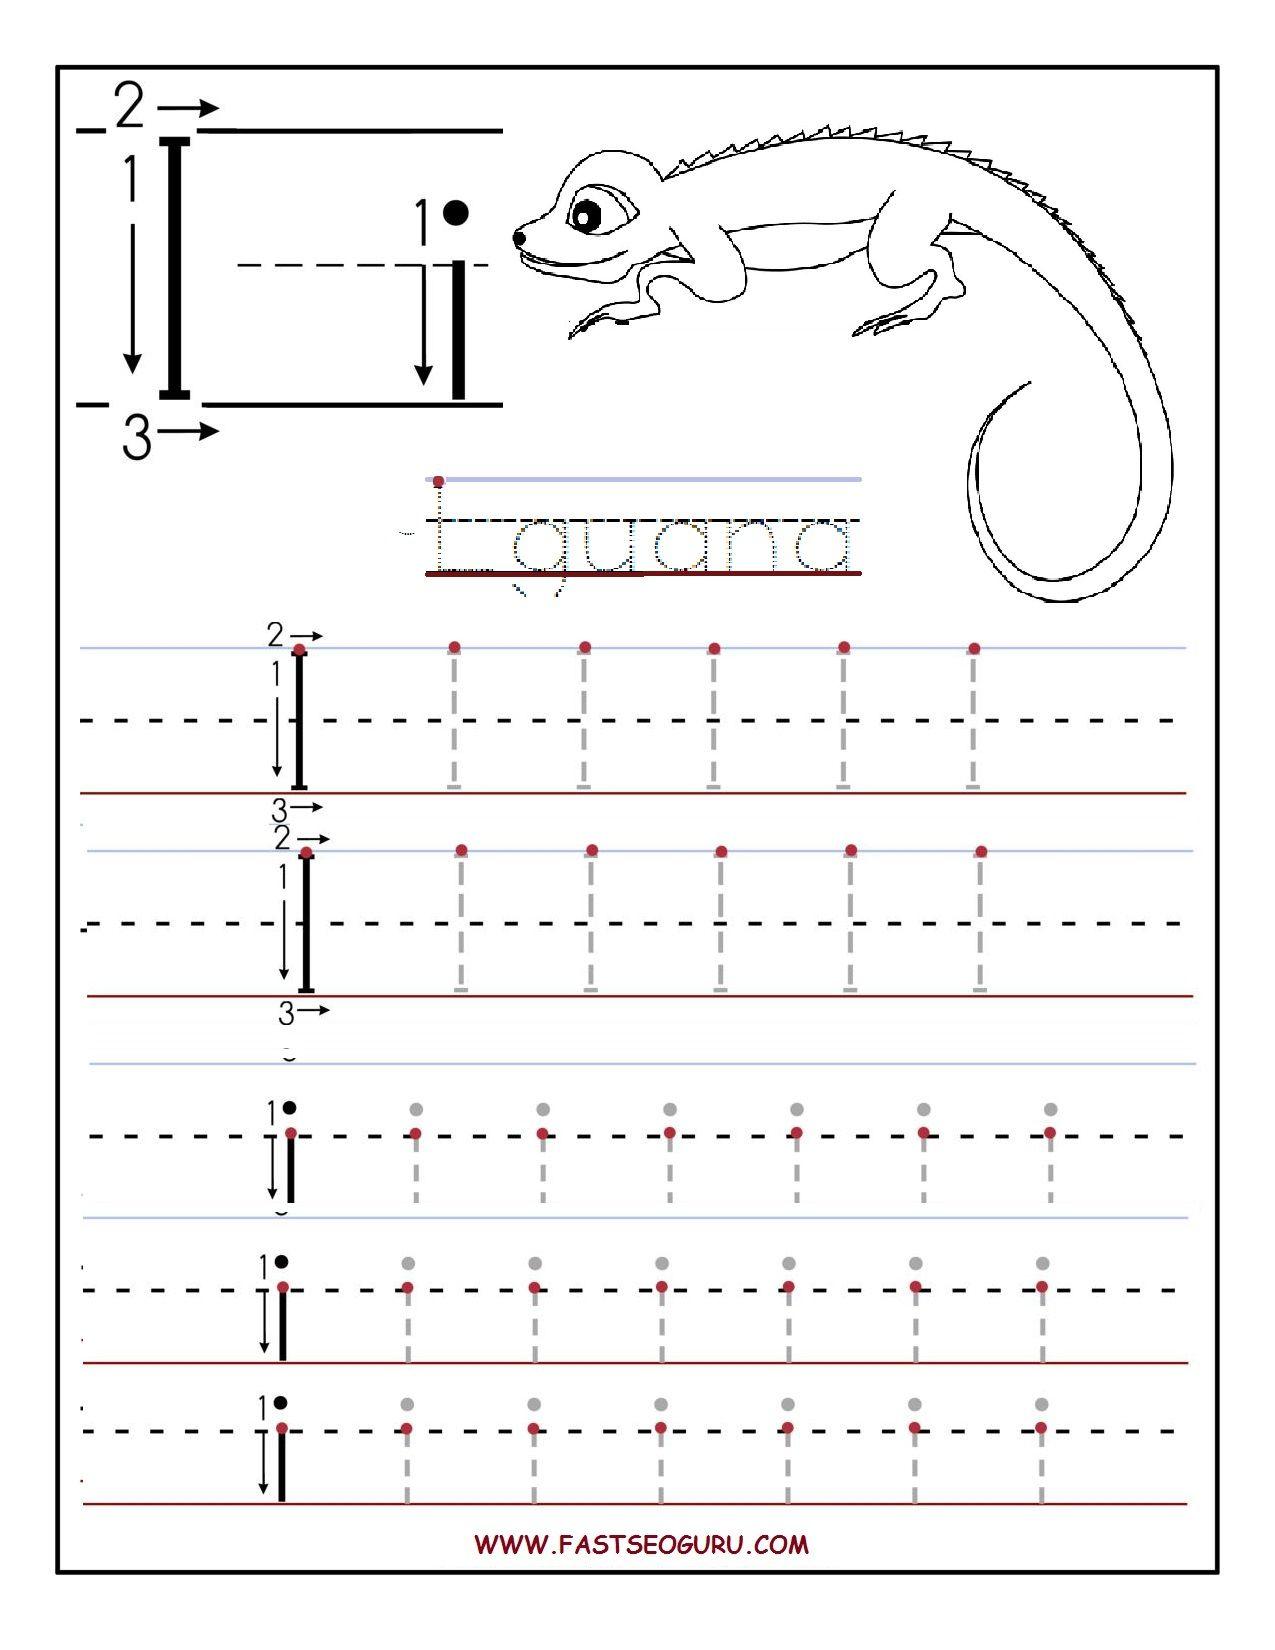 Printable Letter I Tracing Worksheets For Preschool within Letter I Printable Worksheets